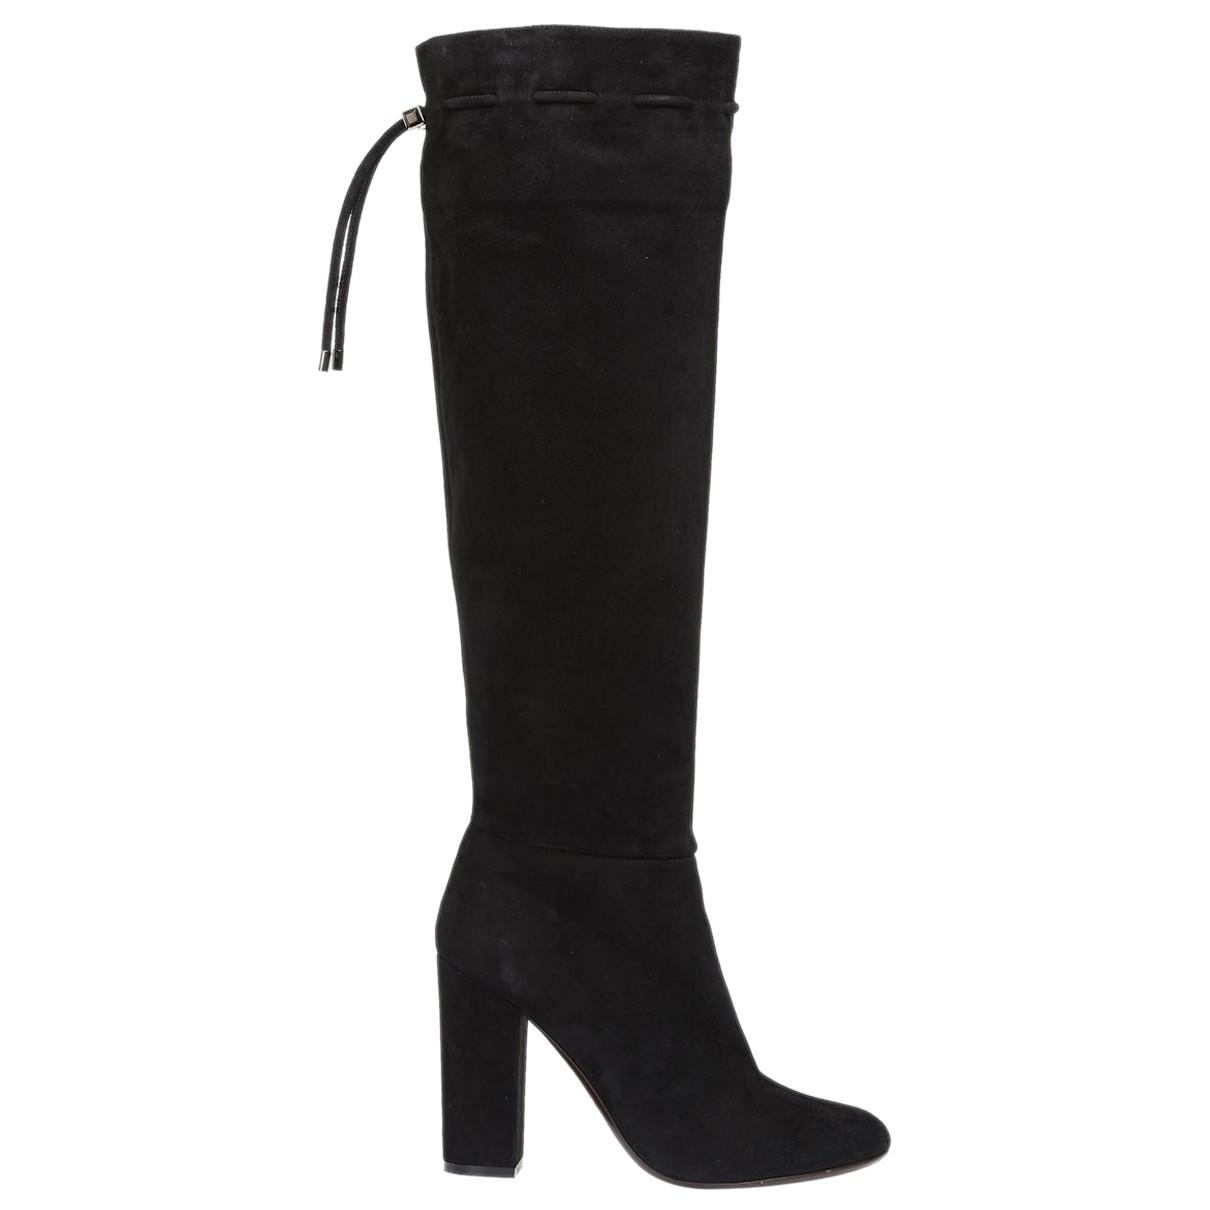 Lanvin \N Black Suede Boots for Women 38.5 IT